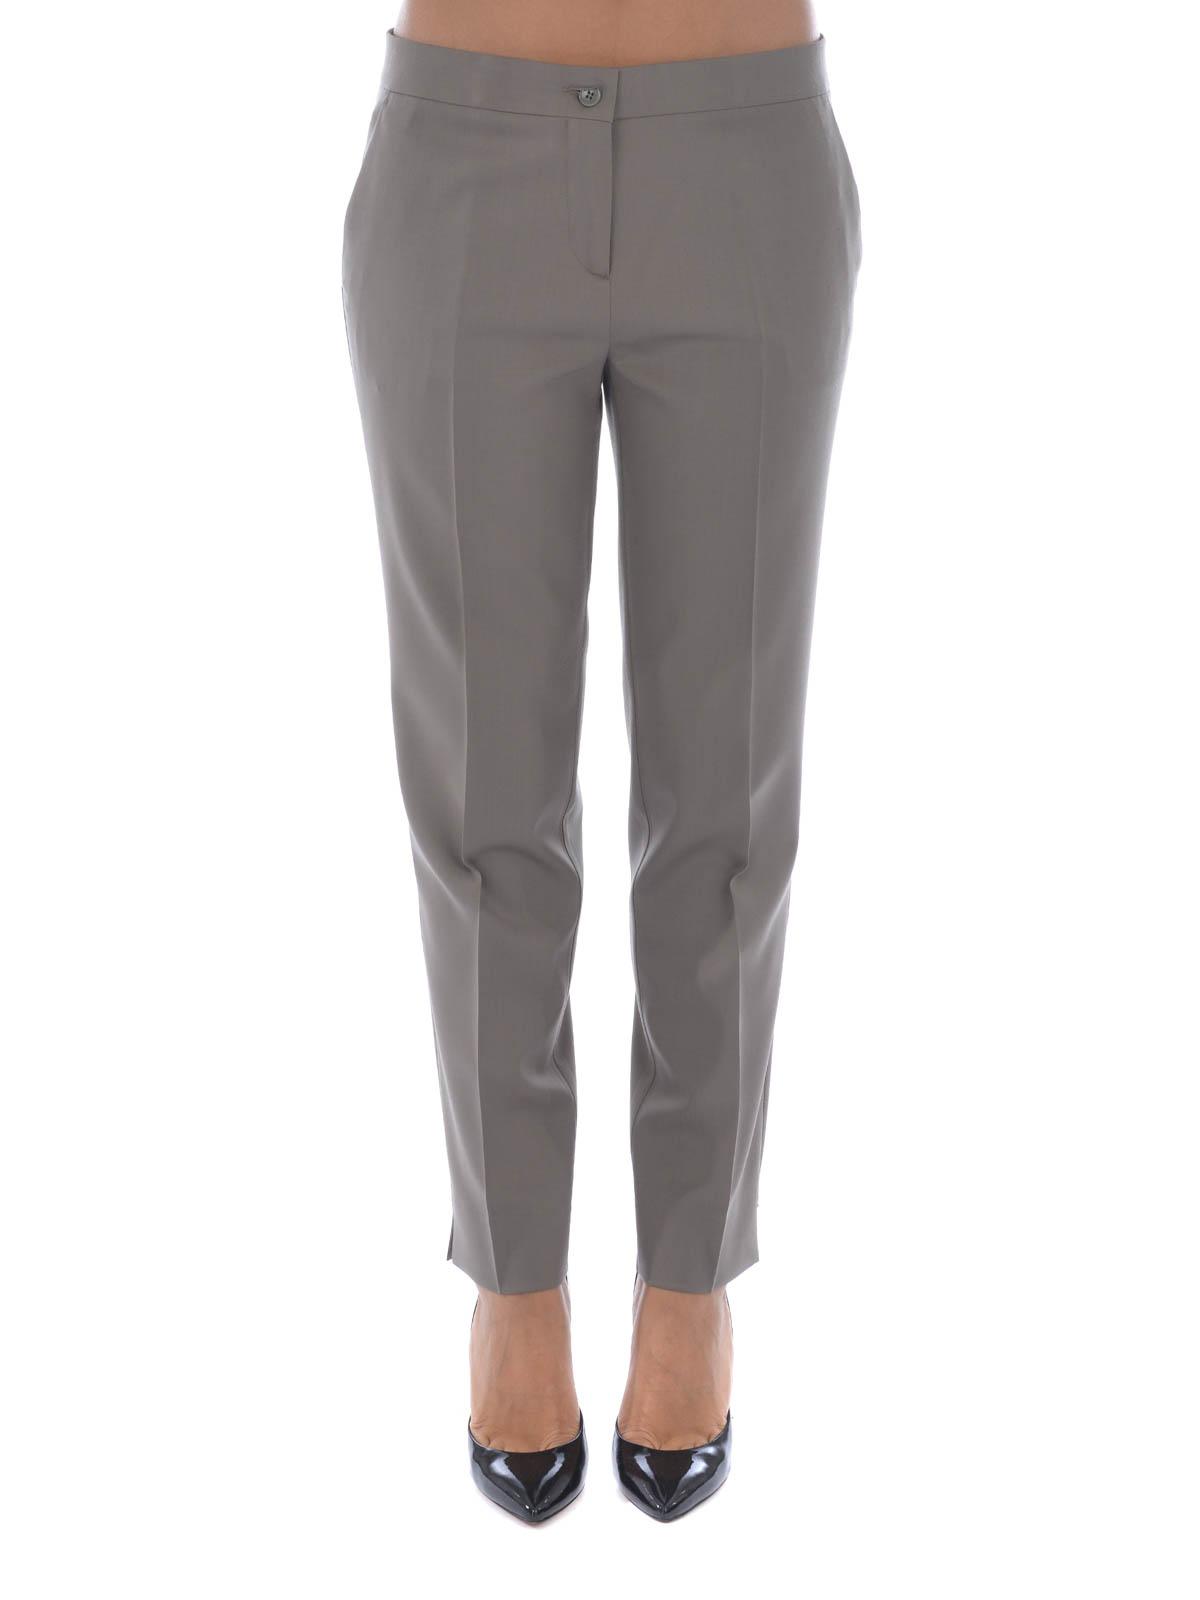 ETRO  Pantalones de sastrerìa online - Pantalón De Vestir Gris Para Mujer b9bdd3c9c9e6